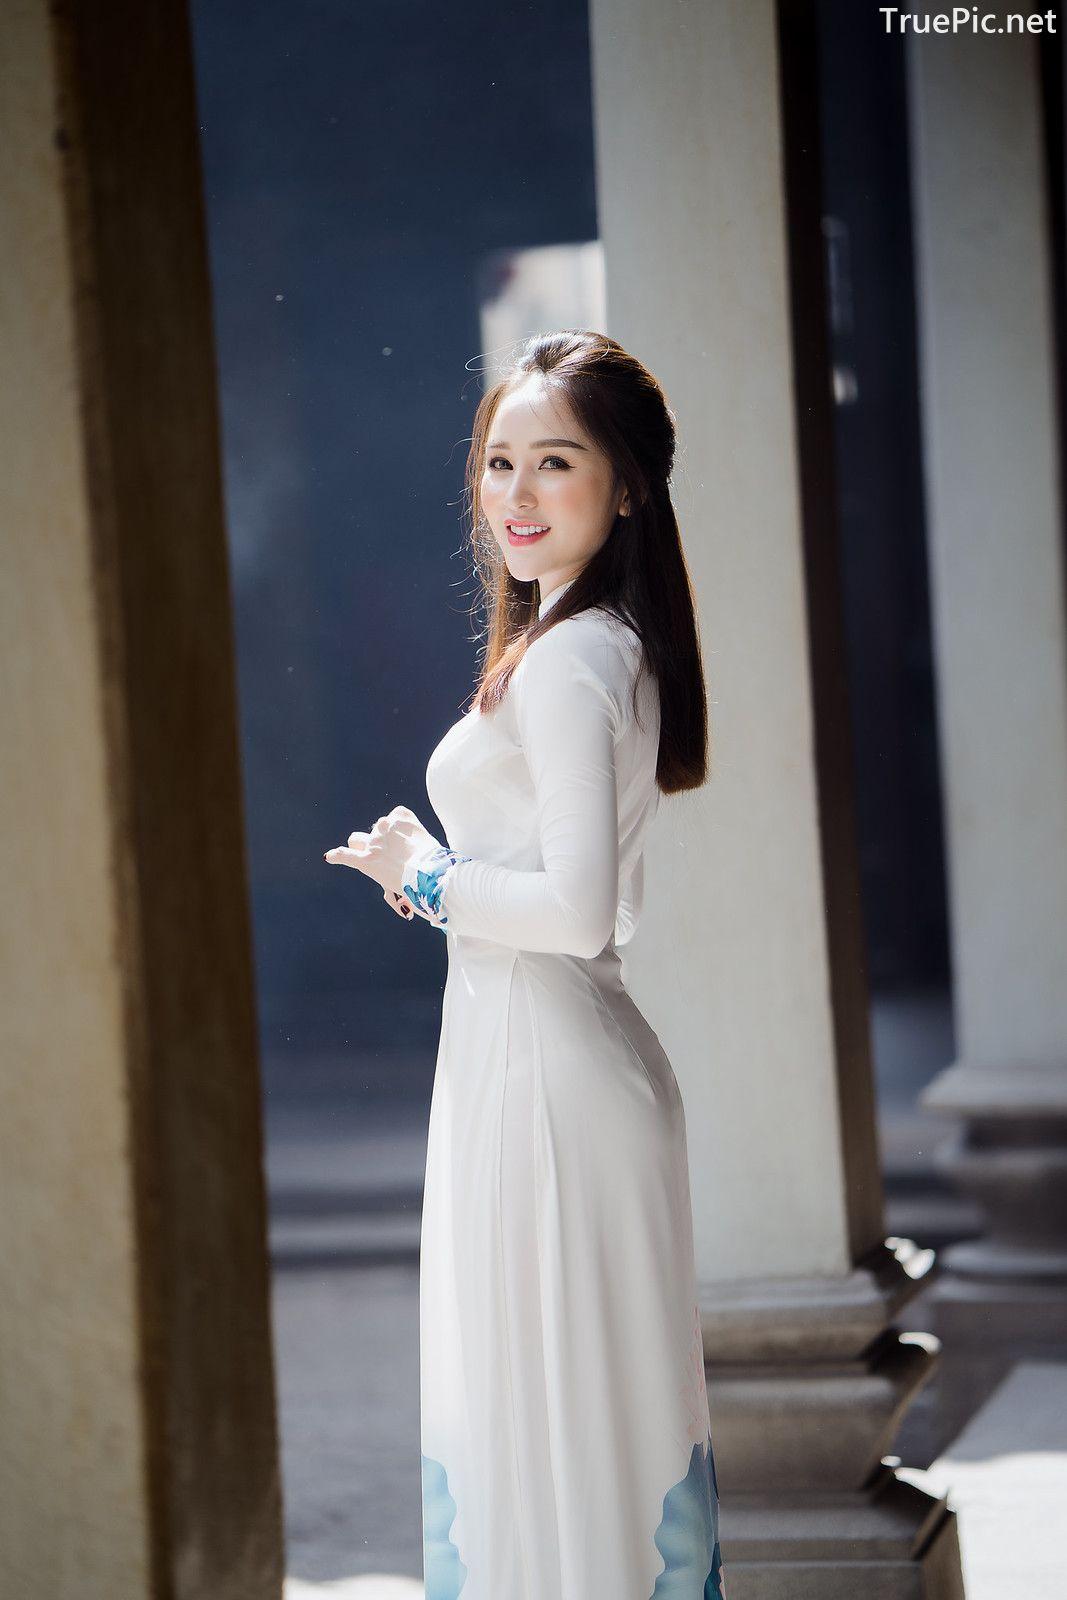 Image-Vietnamese-Beautiful-Girl-Ao-Dai-Vietnam-Traditional-Dress-by-VIN-Photo-1-TruePic.net- Picture-5